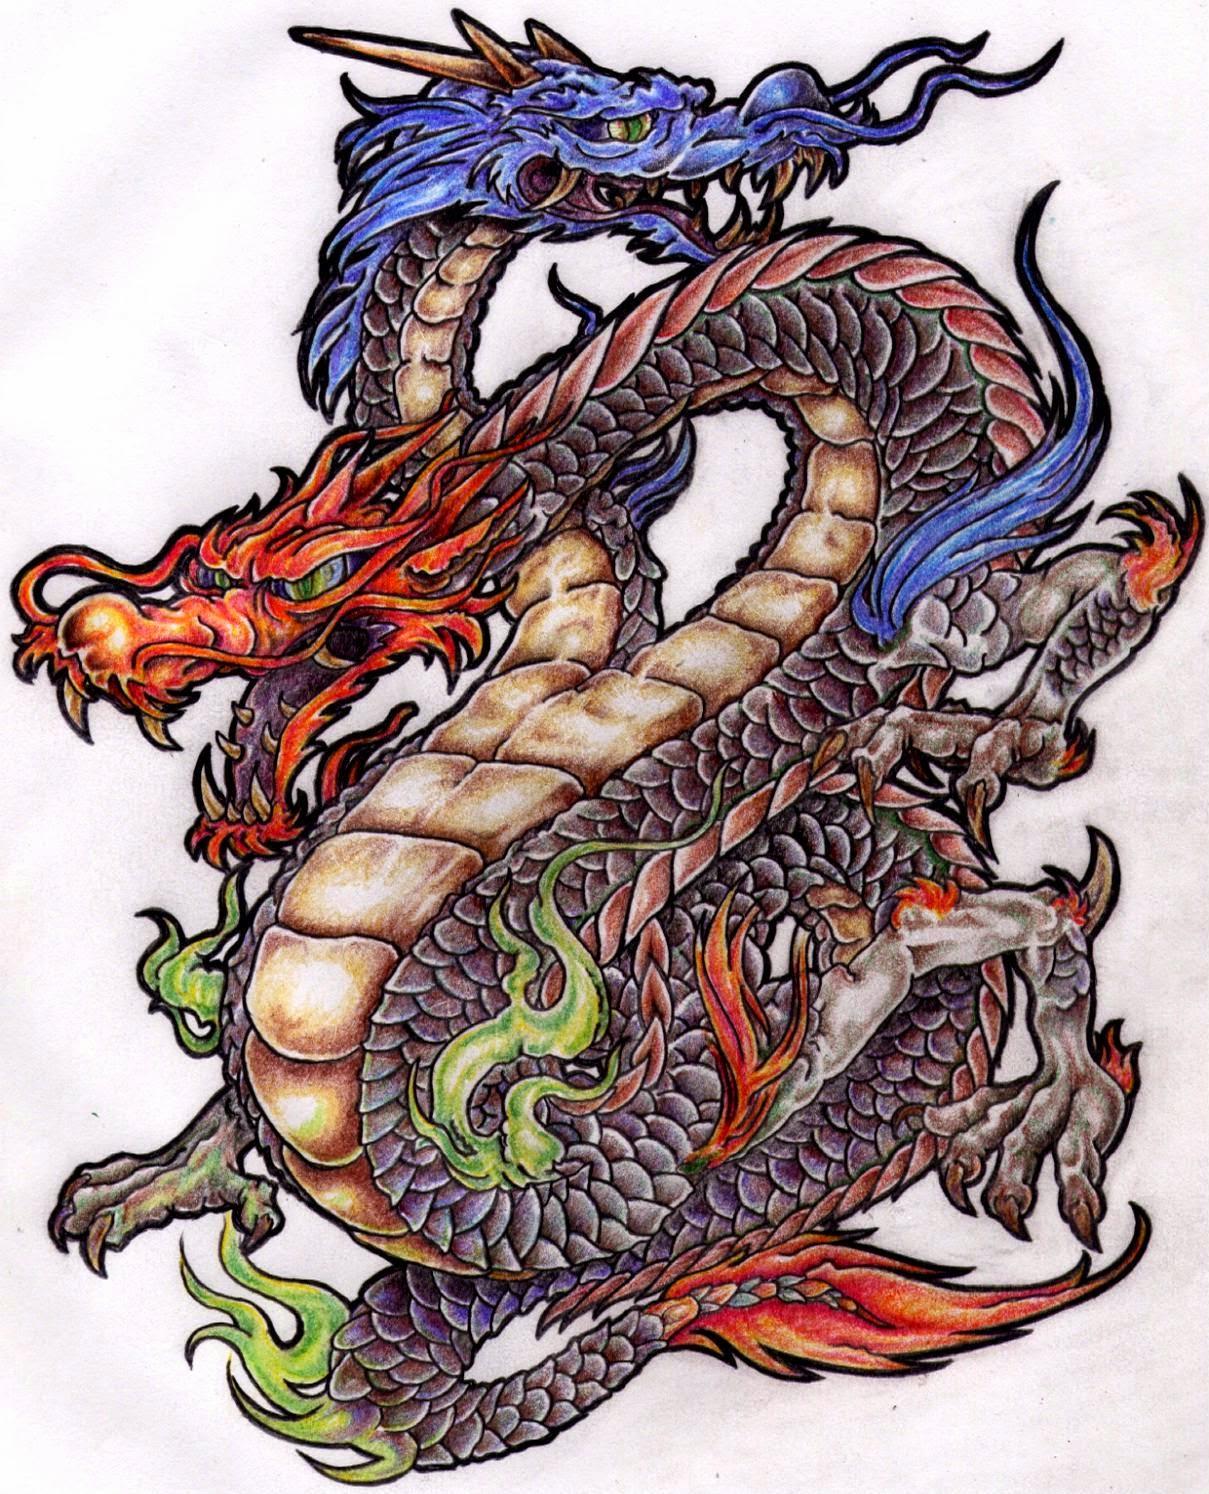 Tattoo Images Stock Photos amp Vectors  Shutterstock